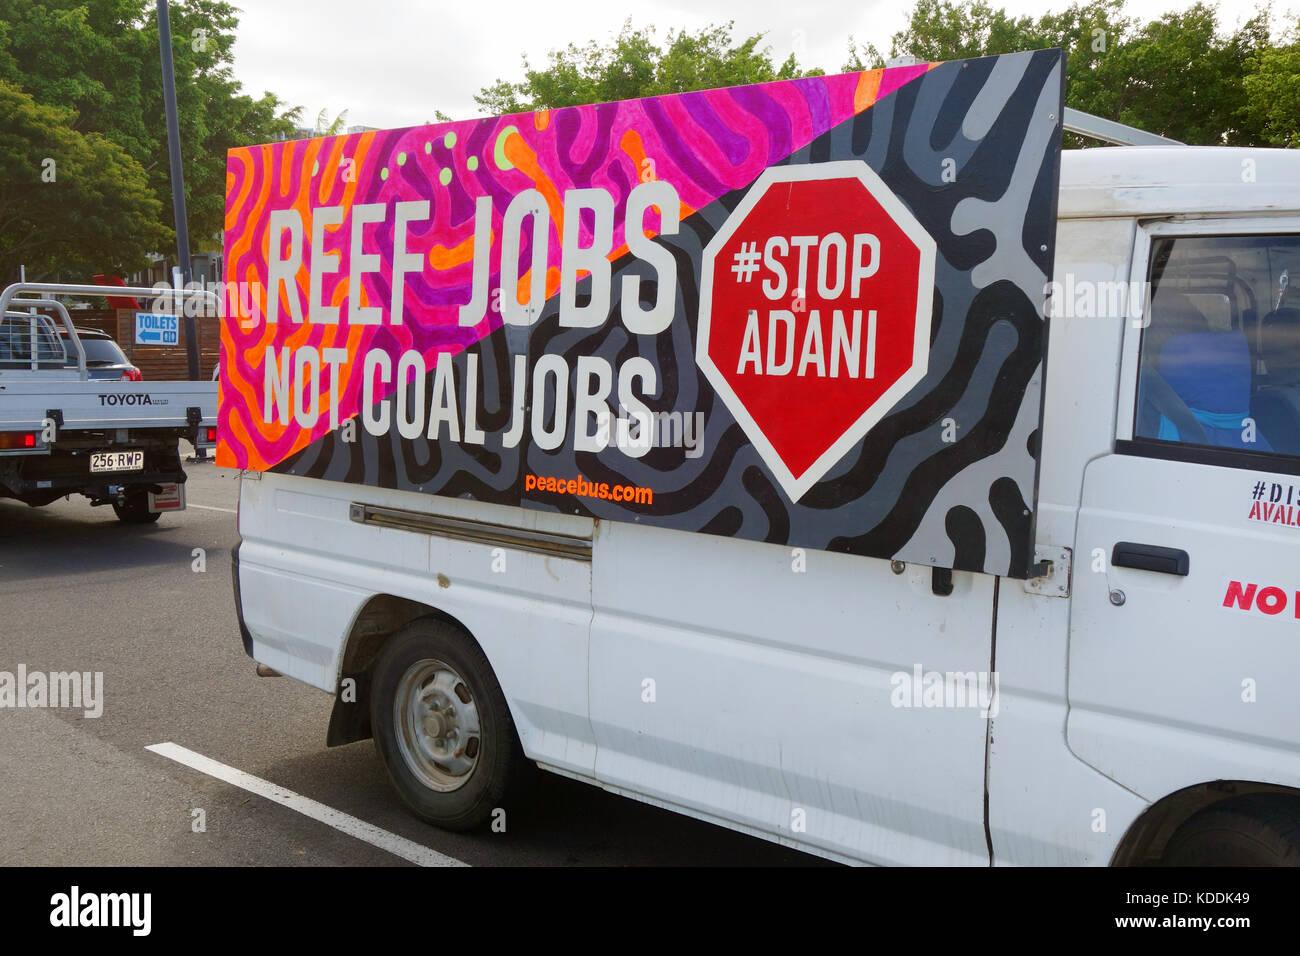 Arrêter Adani placard sur passer van, Cairns, Queensland, Australie. Pas de PR Photo Stock